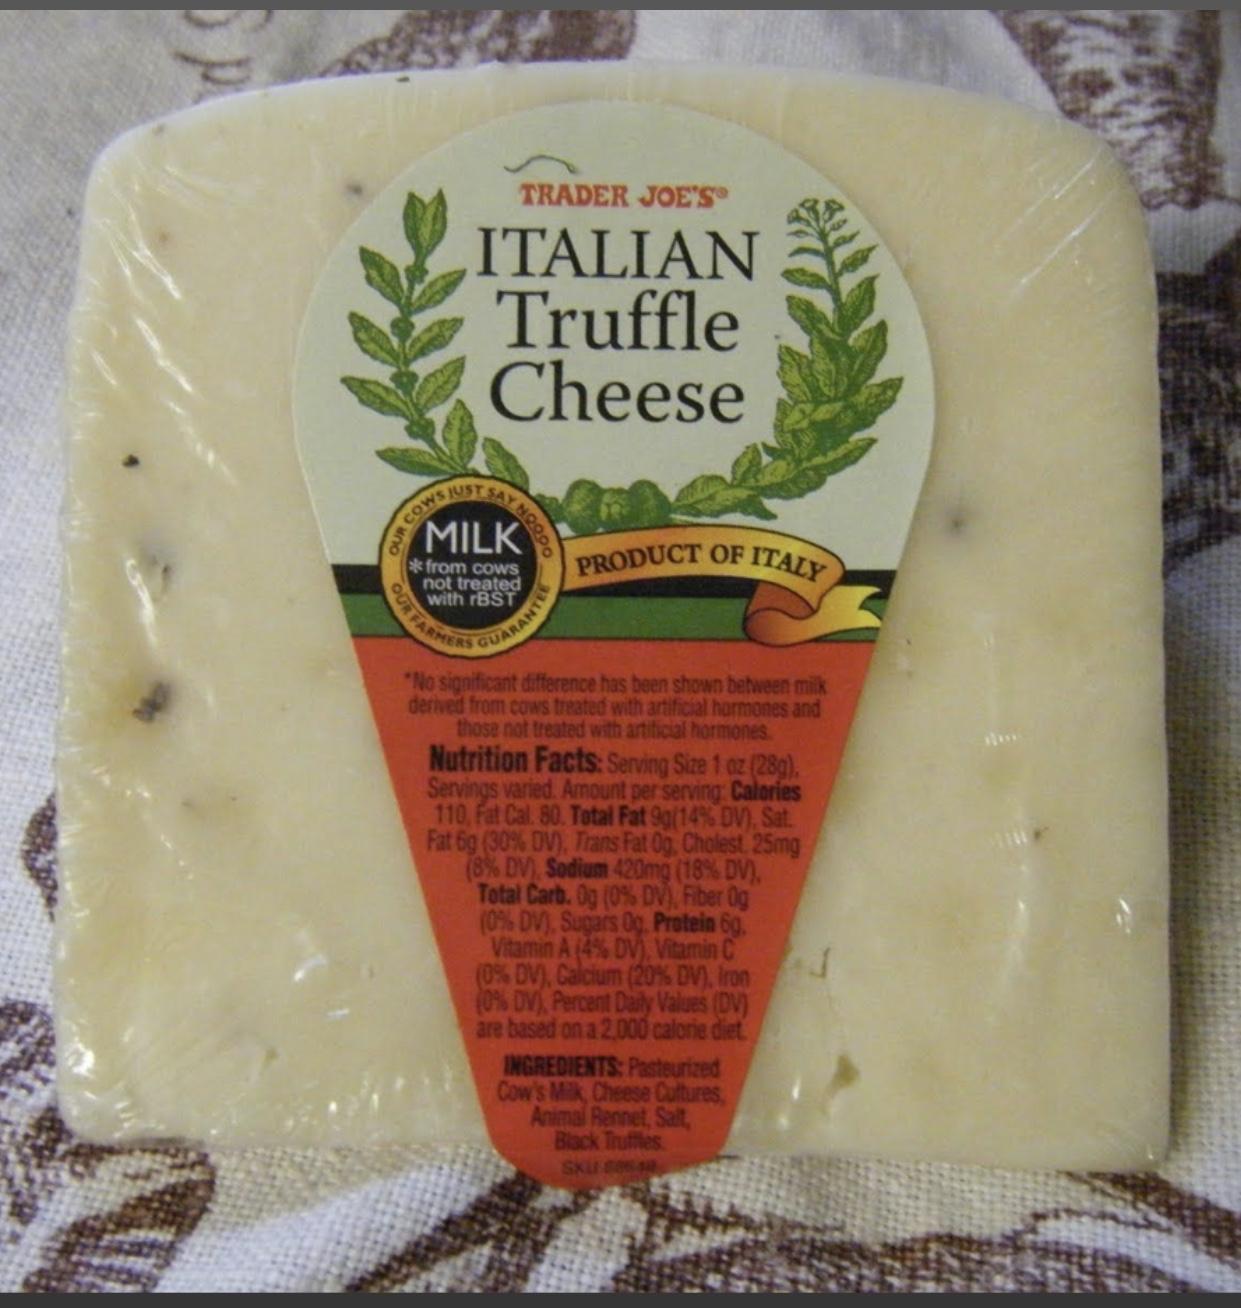 Italian Truffle Cheese